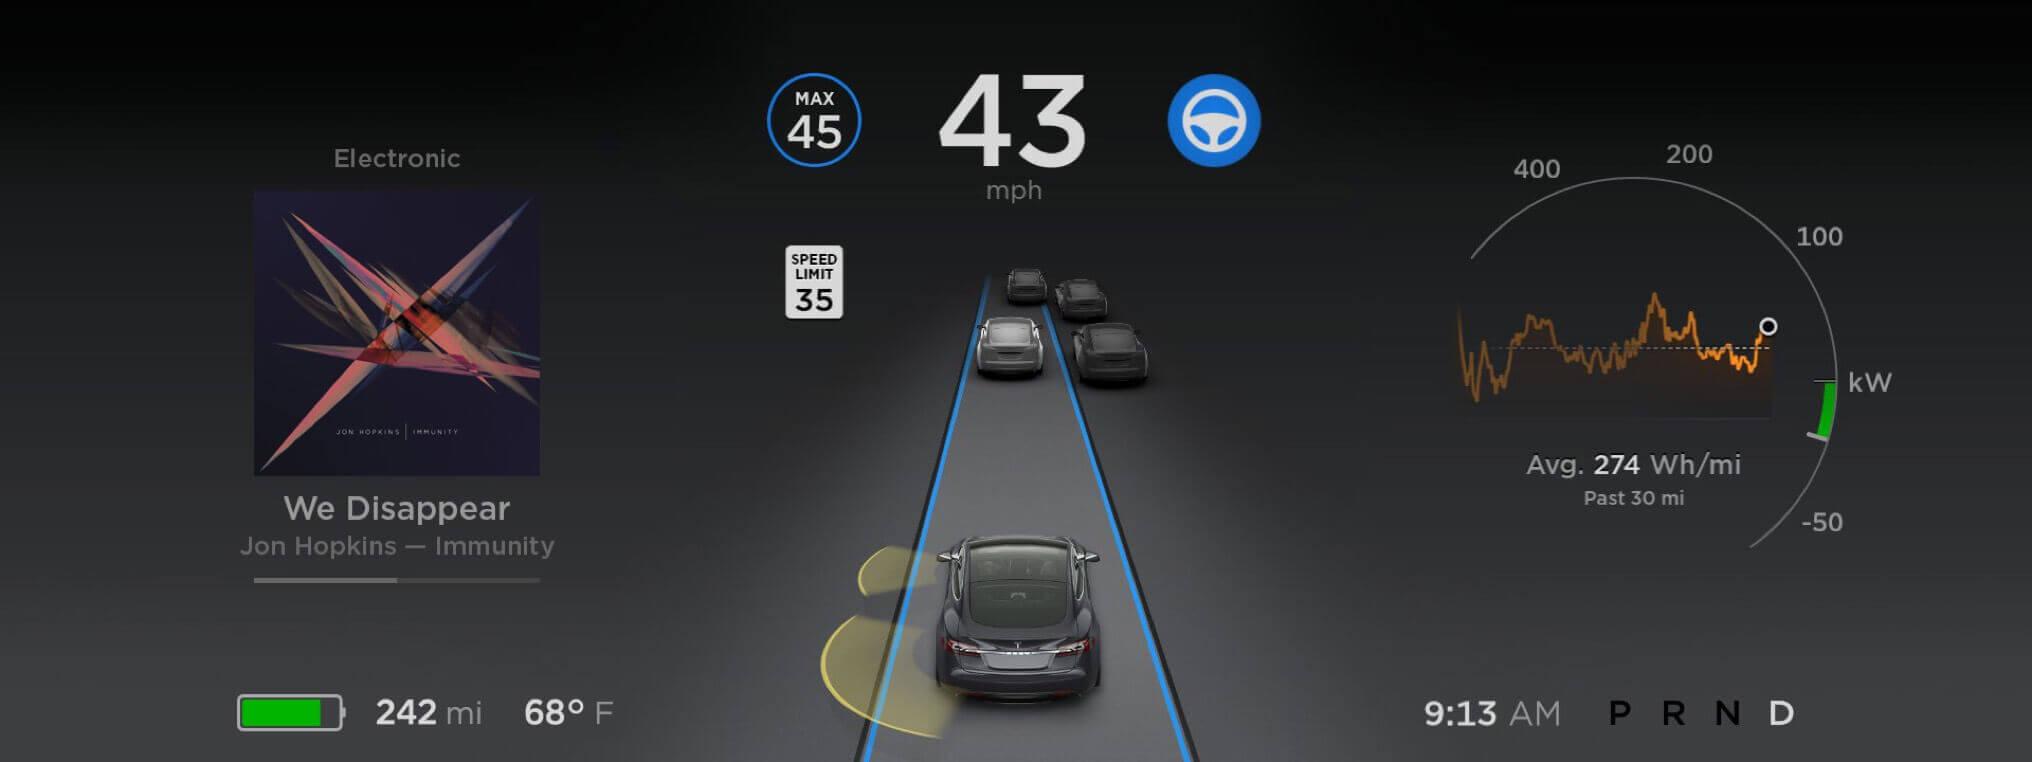 Tesla software 8.0 - Autopilot